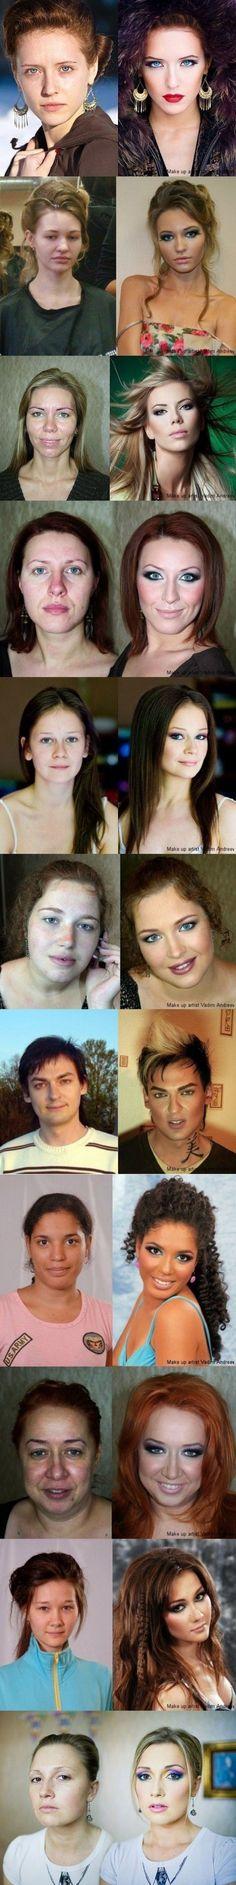 Before and after. Russian makeup artist Vadim Andreev.  profgasparetto eagasparetto Dom Gaspar I www.profgasparetto21.wordpress.com https://independent.academia.edu/profeagasparetto http://cinemagister.pbworks.com/w/page/89742752/Prof%20EA%20Gasparetto